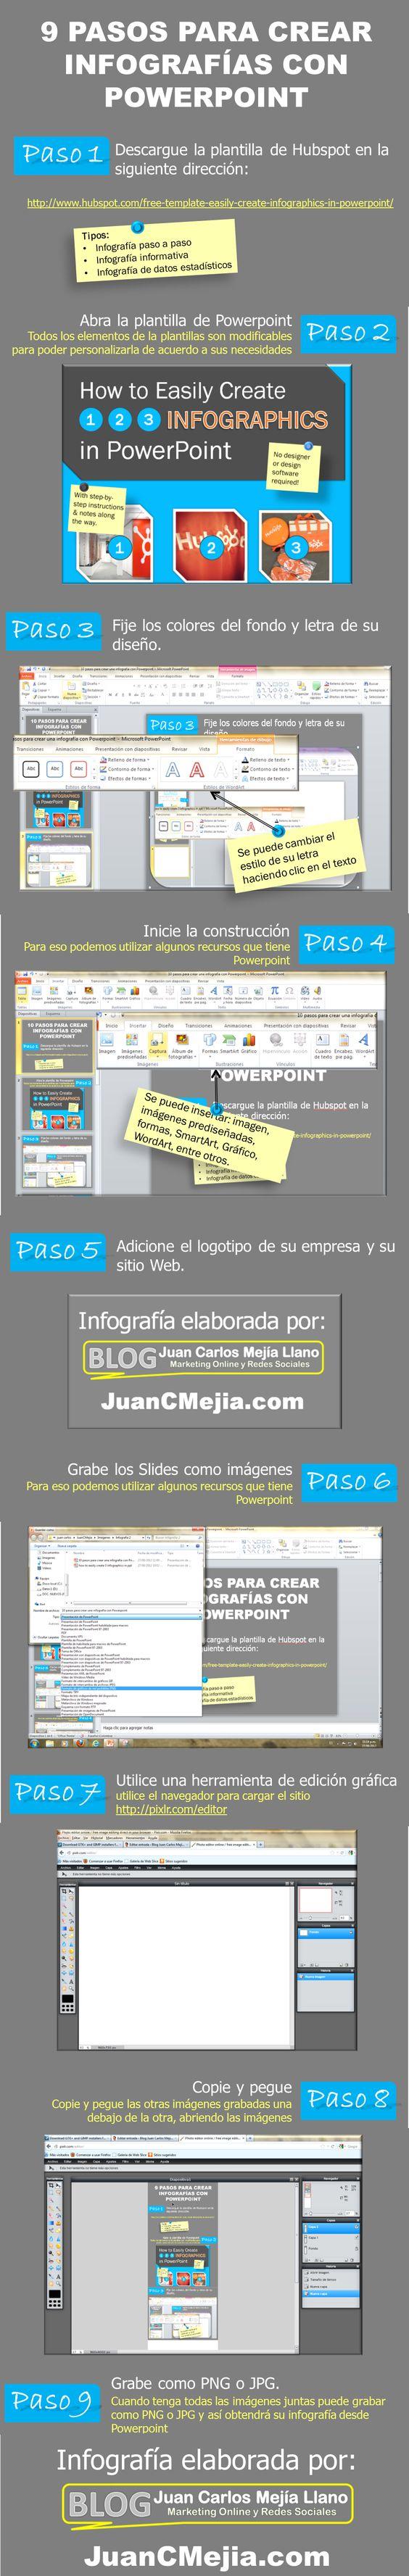 Infografía en español que muestra 9 pasos para crear infografías con PowerPoint. Excelente opción para no diseñadores